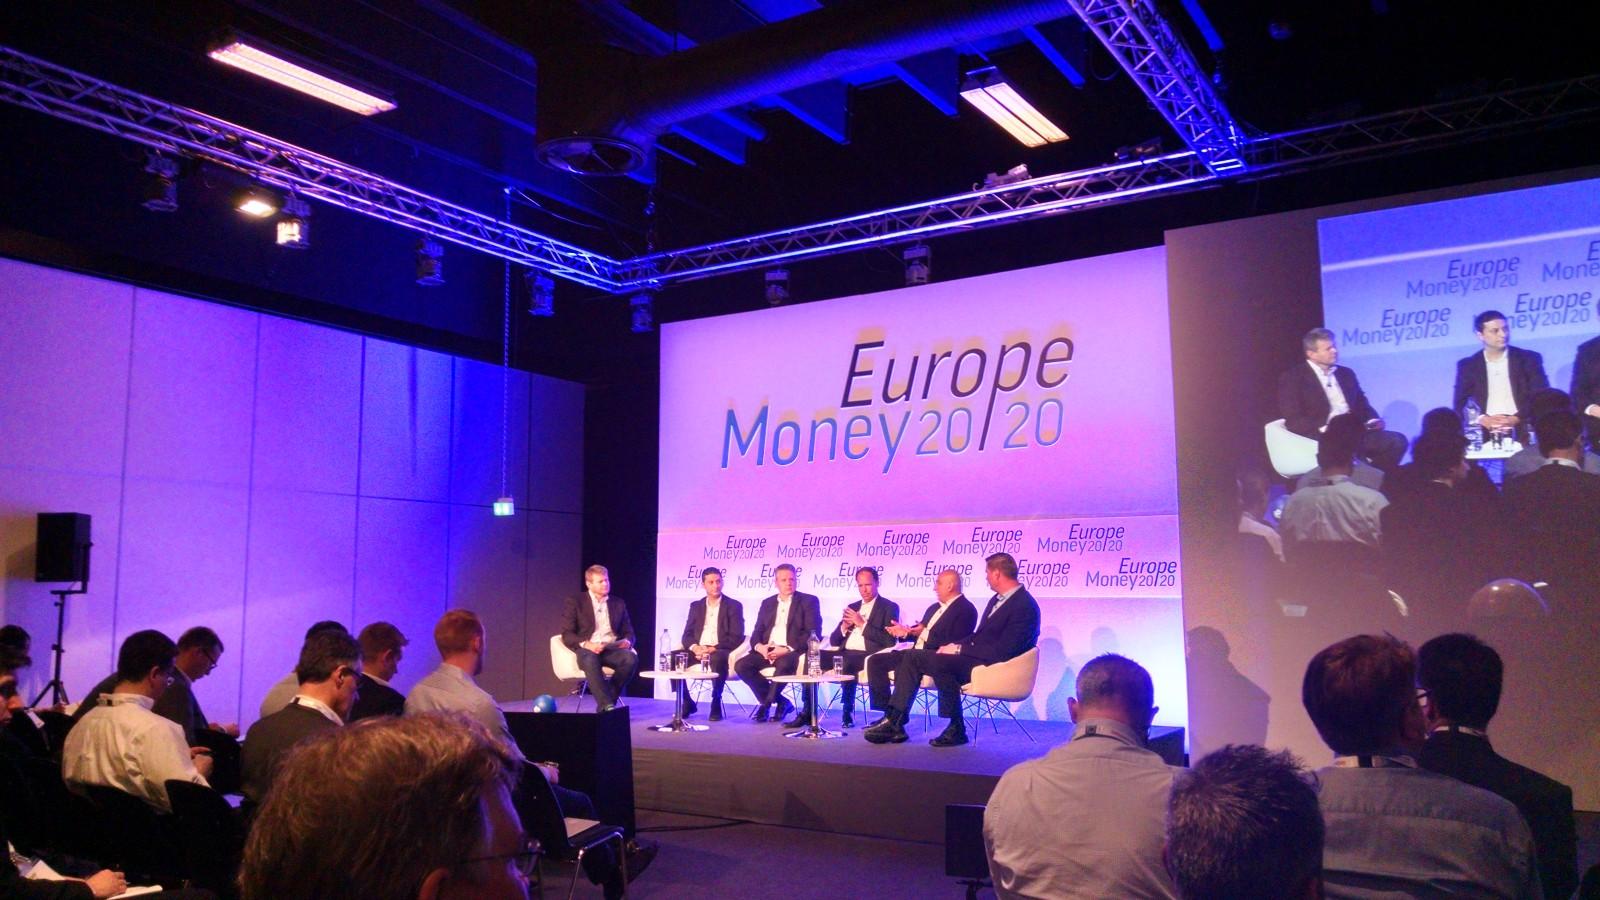 money20-20 Амстердам конференция Амстердам конгресс